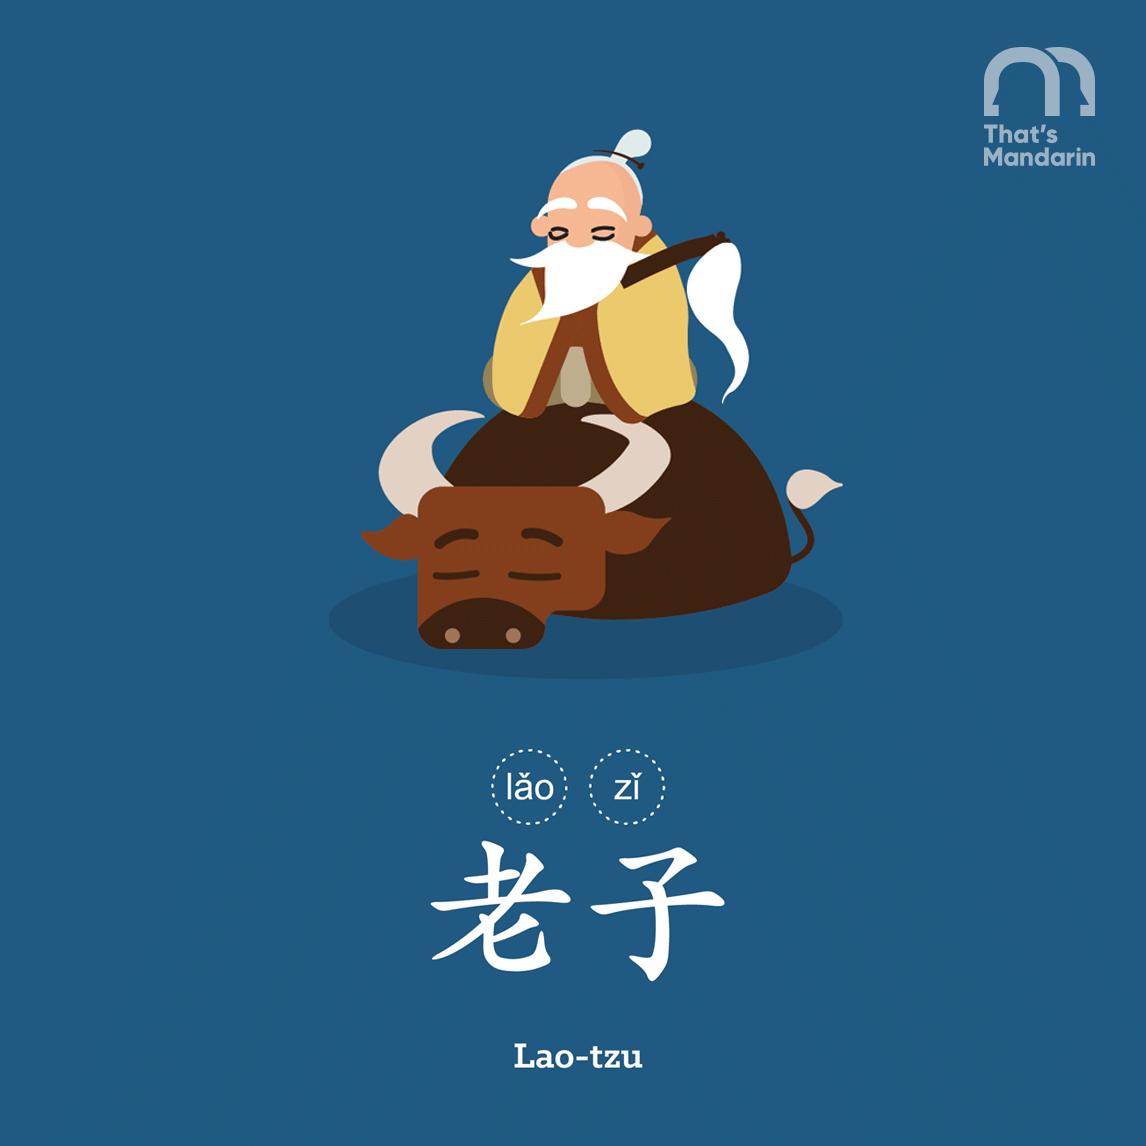 linkwords 3 wise men of Chinese ideologies laozi LaoT | That's Mandarin